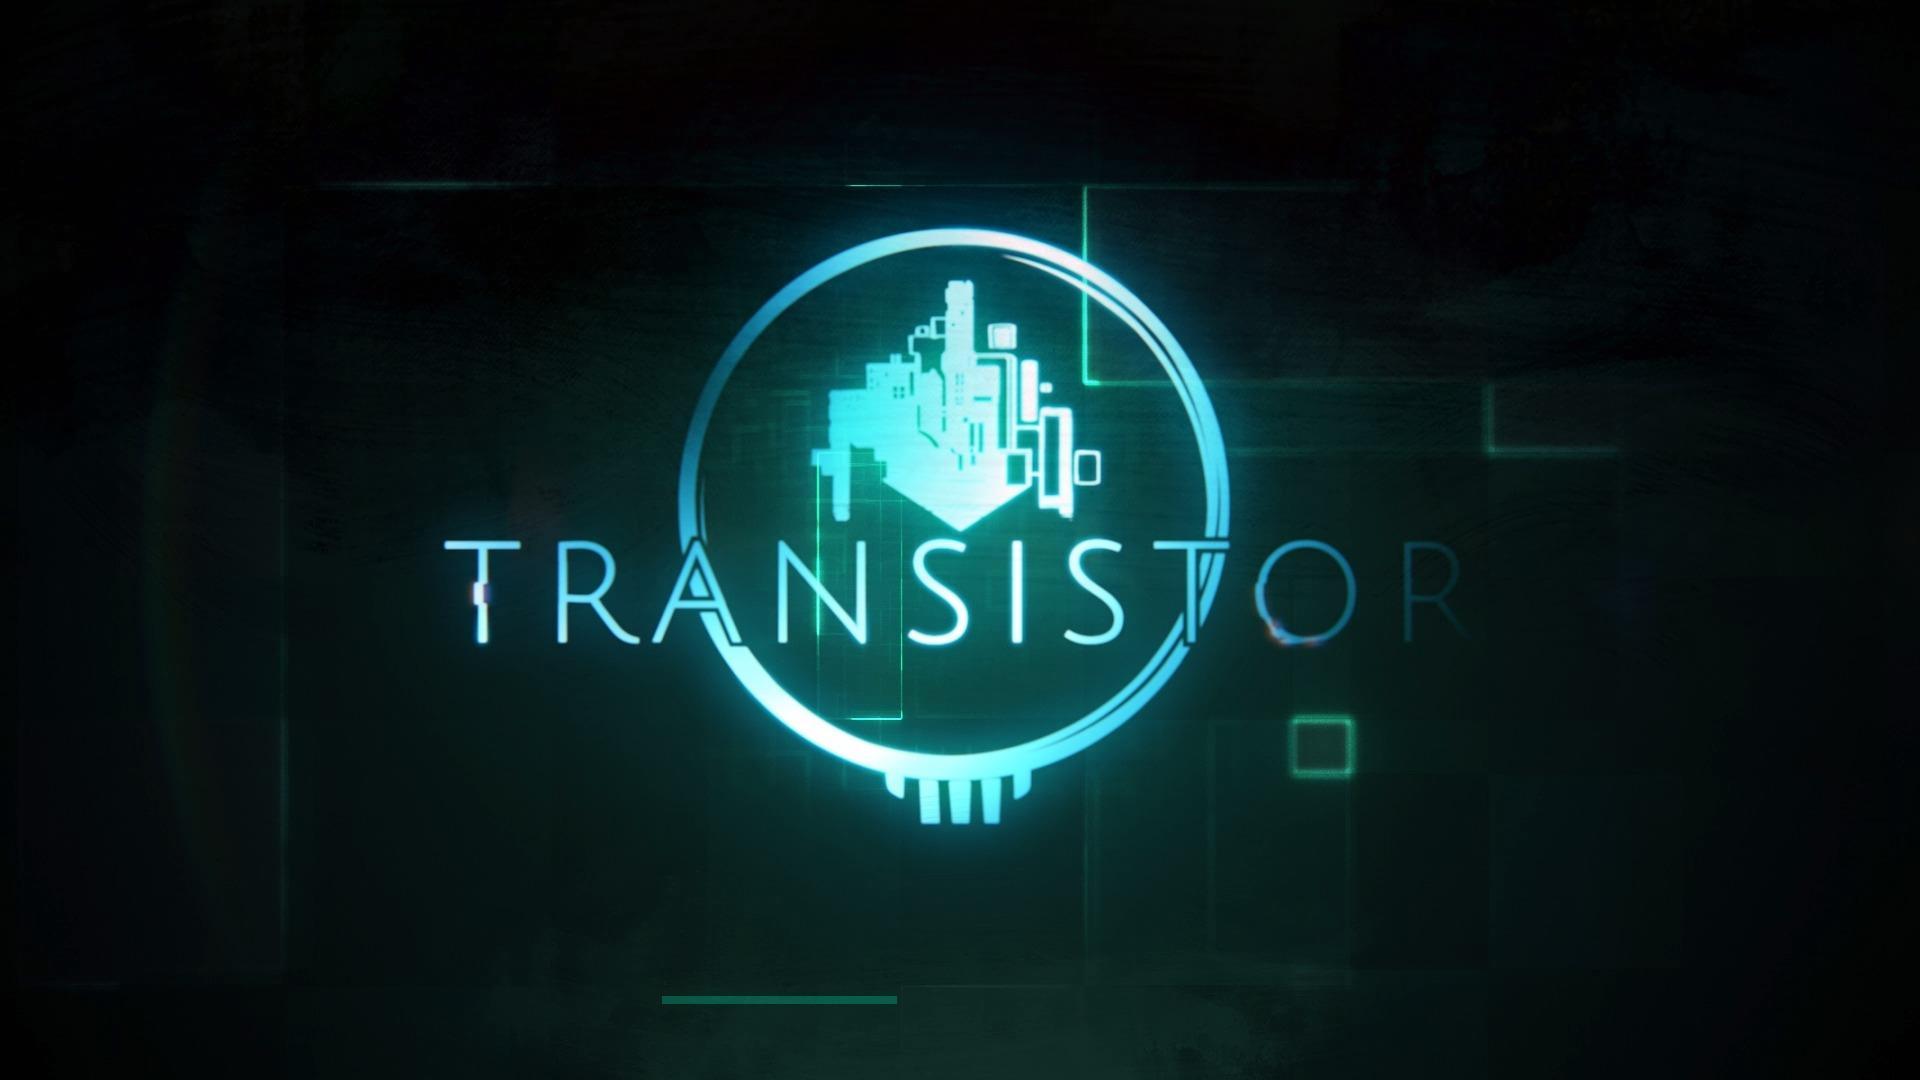 http://mediad.publicbroadcasting.net/p/kmuw/files/styles/x_large/public/201405/Transistor_20140521233531.jpeg